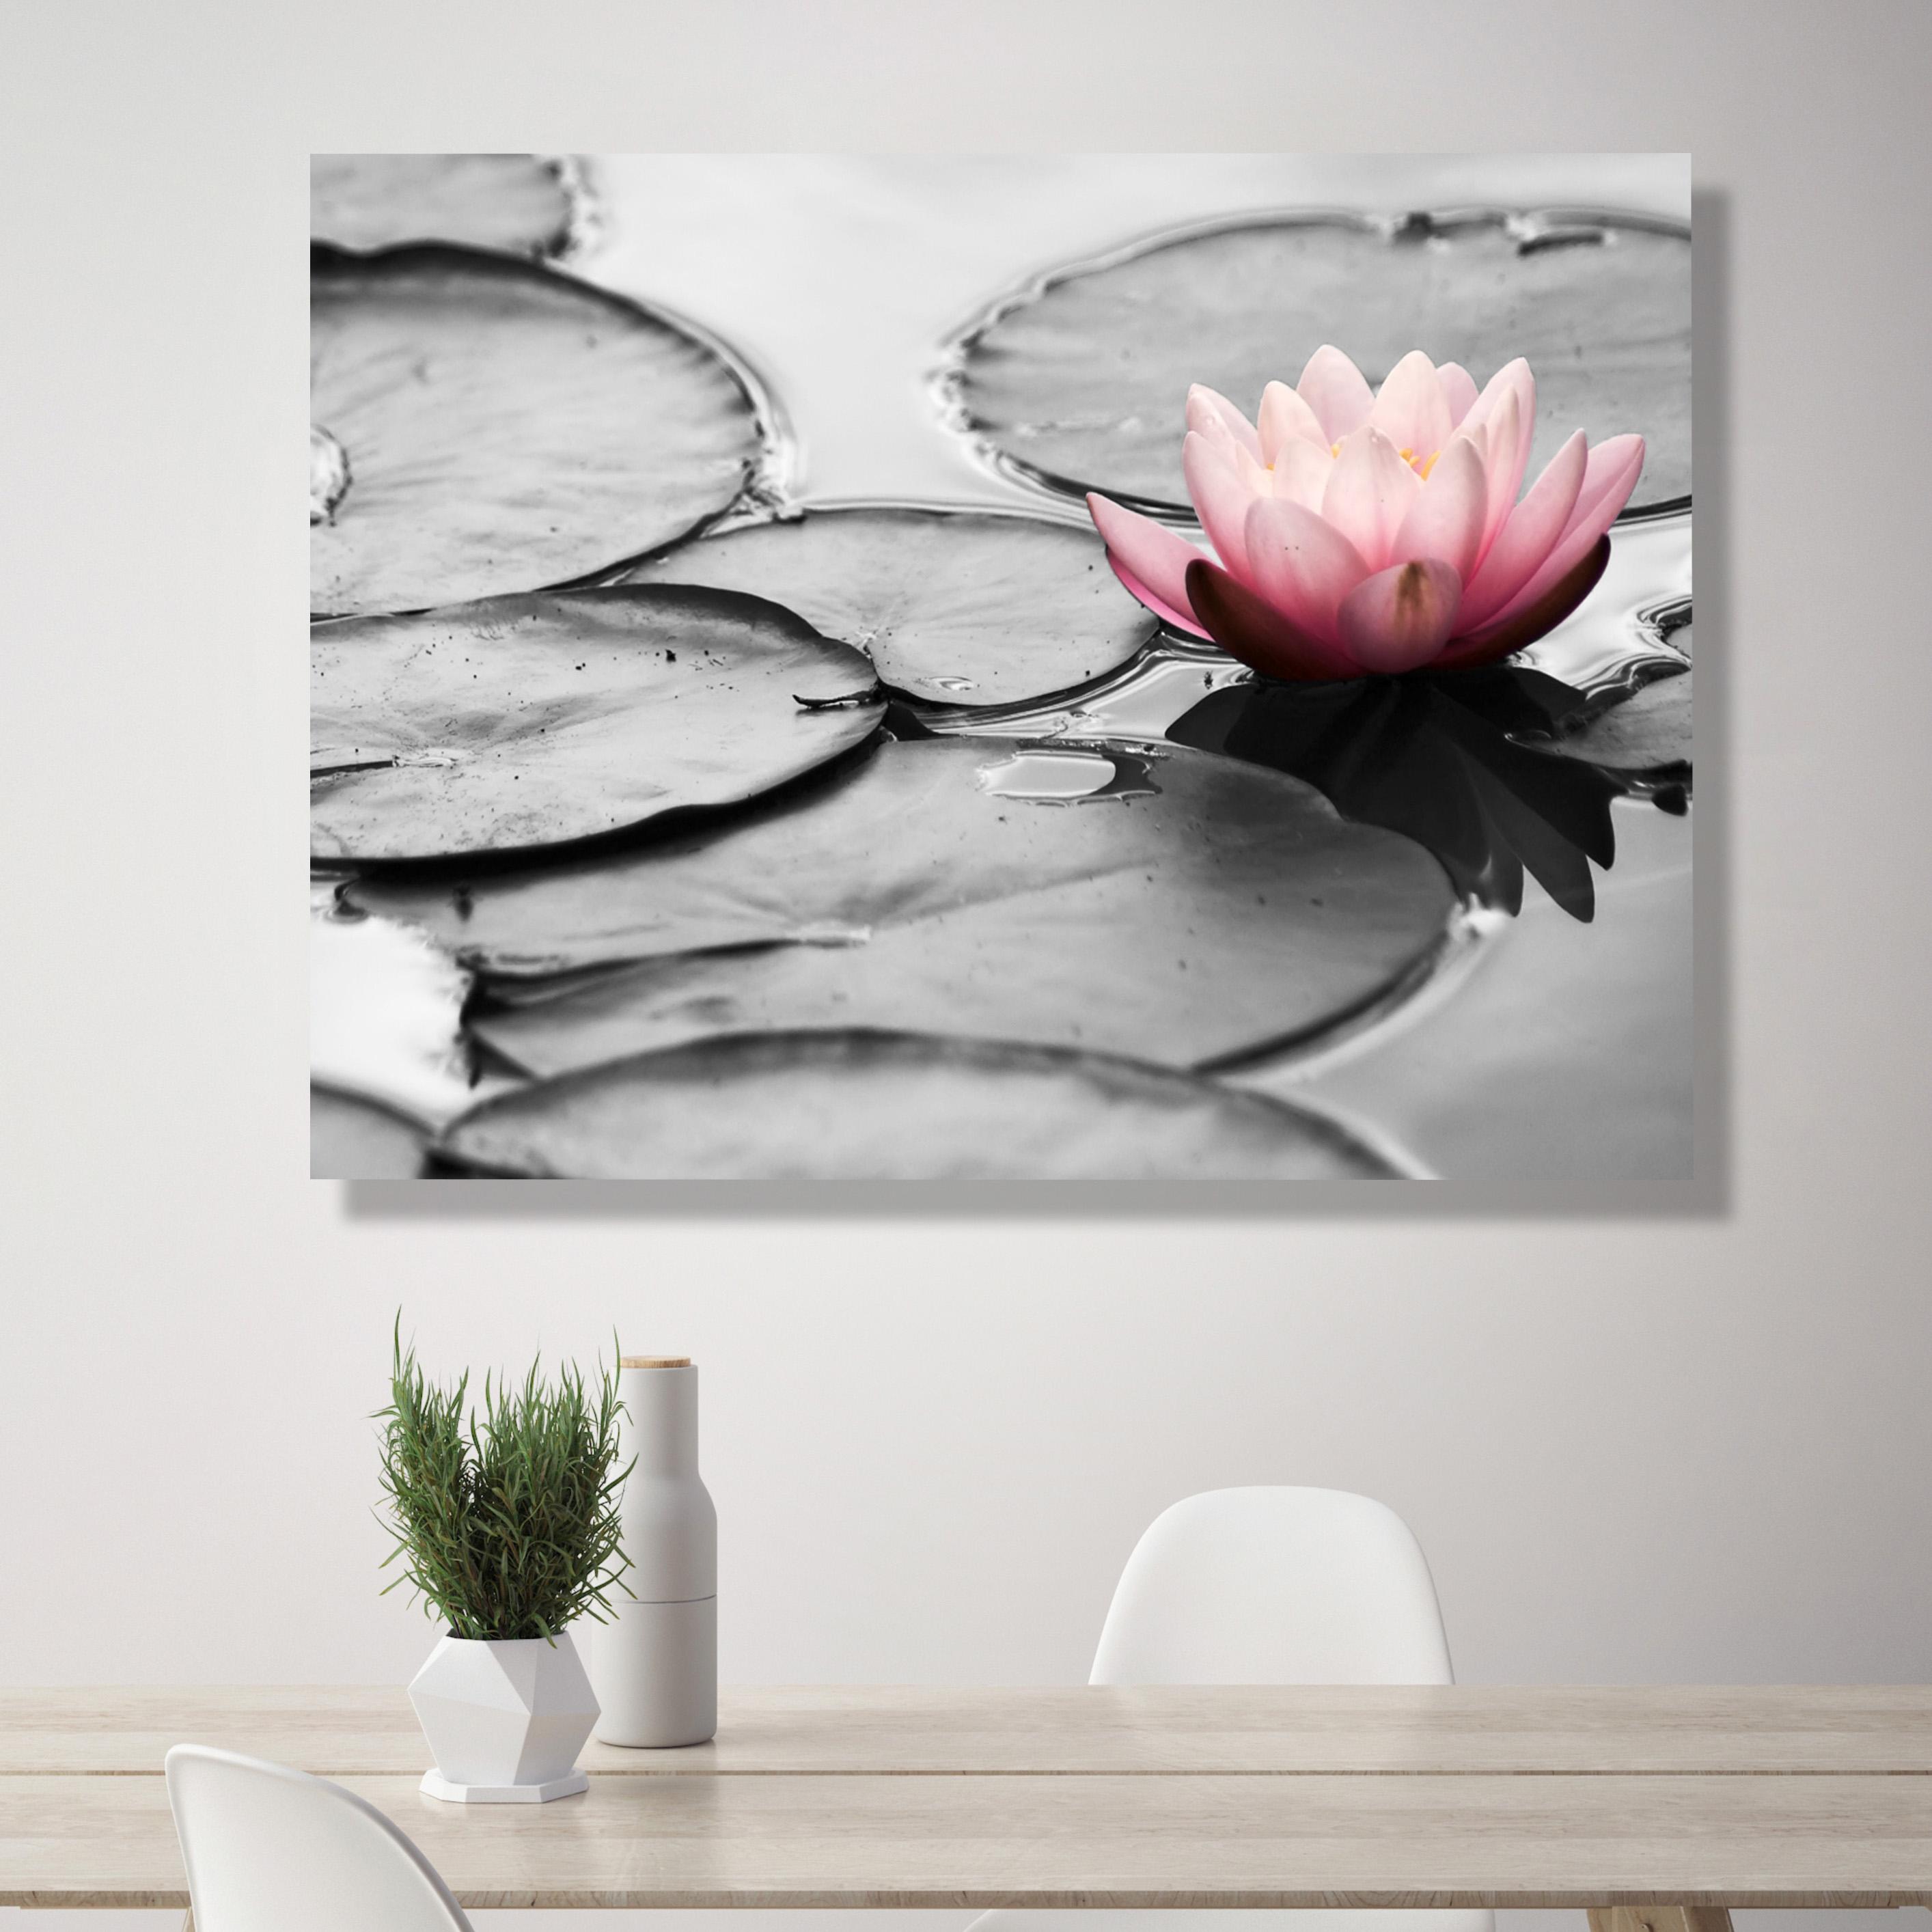 067aa0e110c34c Sound-Absorbing Wall Art - Water Lily   Canvasbutik.com